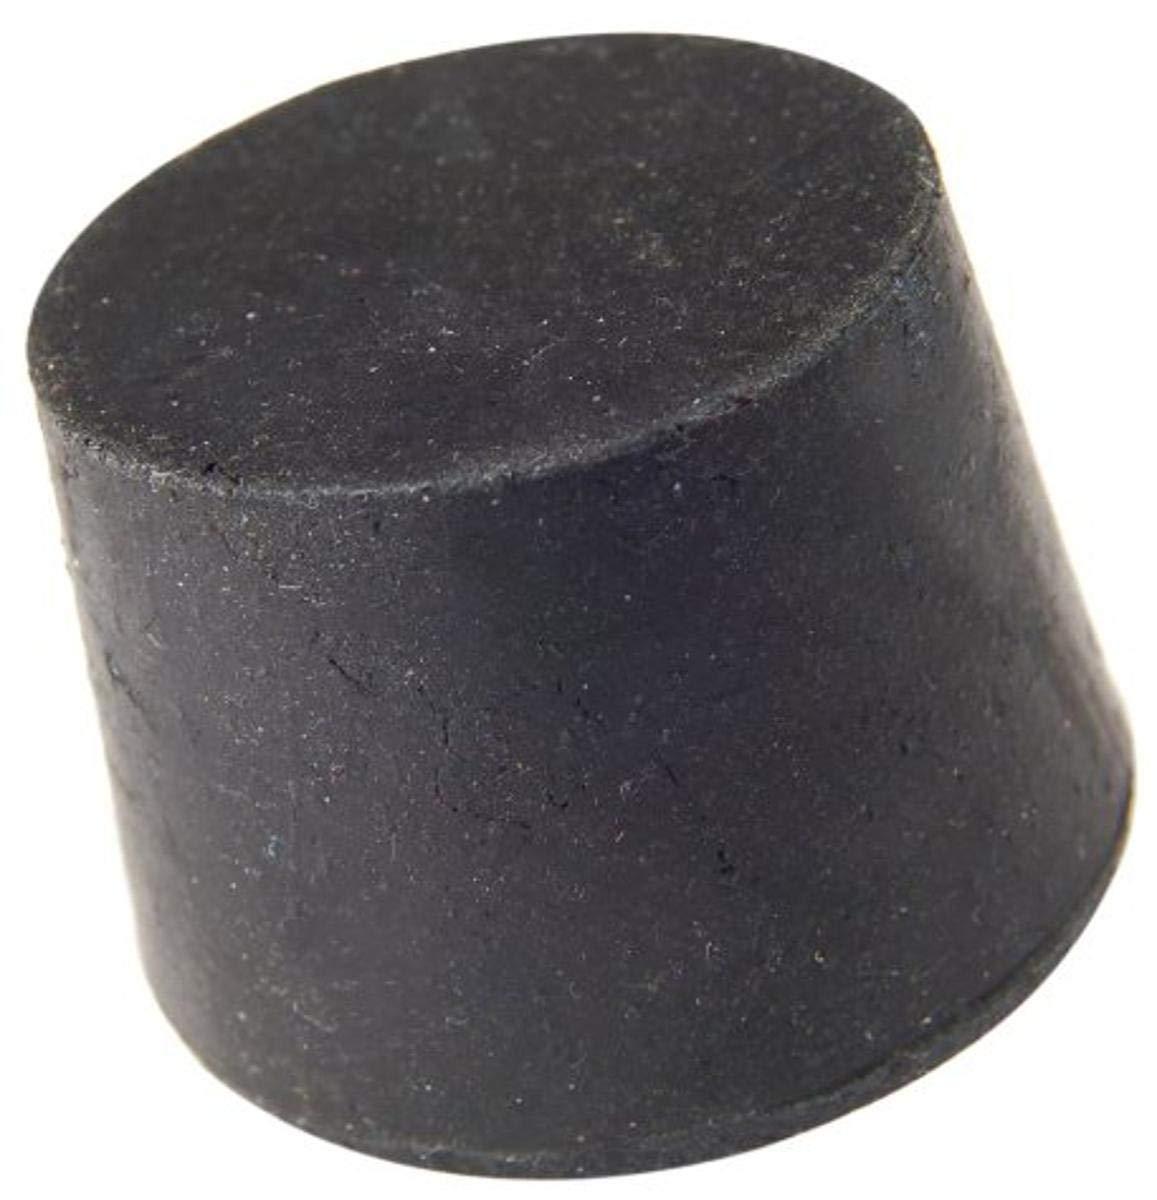 Plasticoid H5.5M290 Black Rubber Solid Stopper, 28mm Top Diameter, 24mm Bottom Diameter, 5.5 Size, 25mm Length